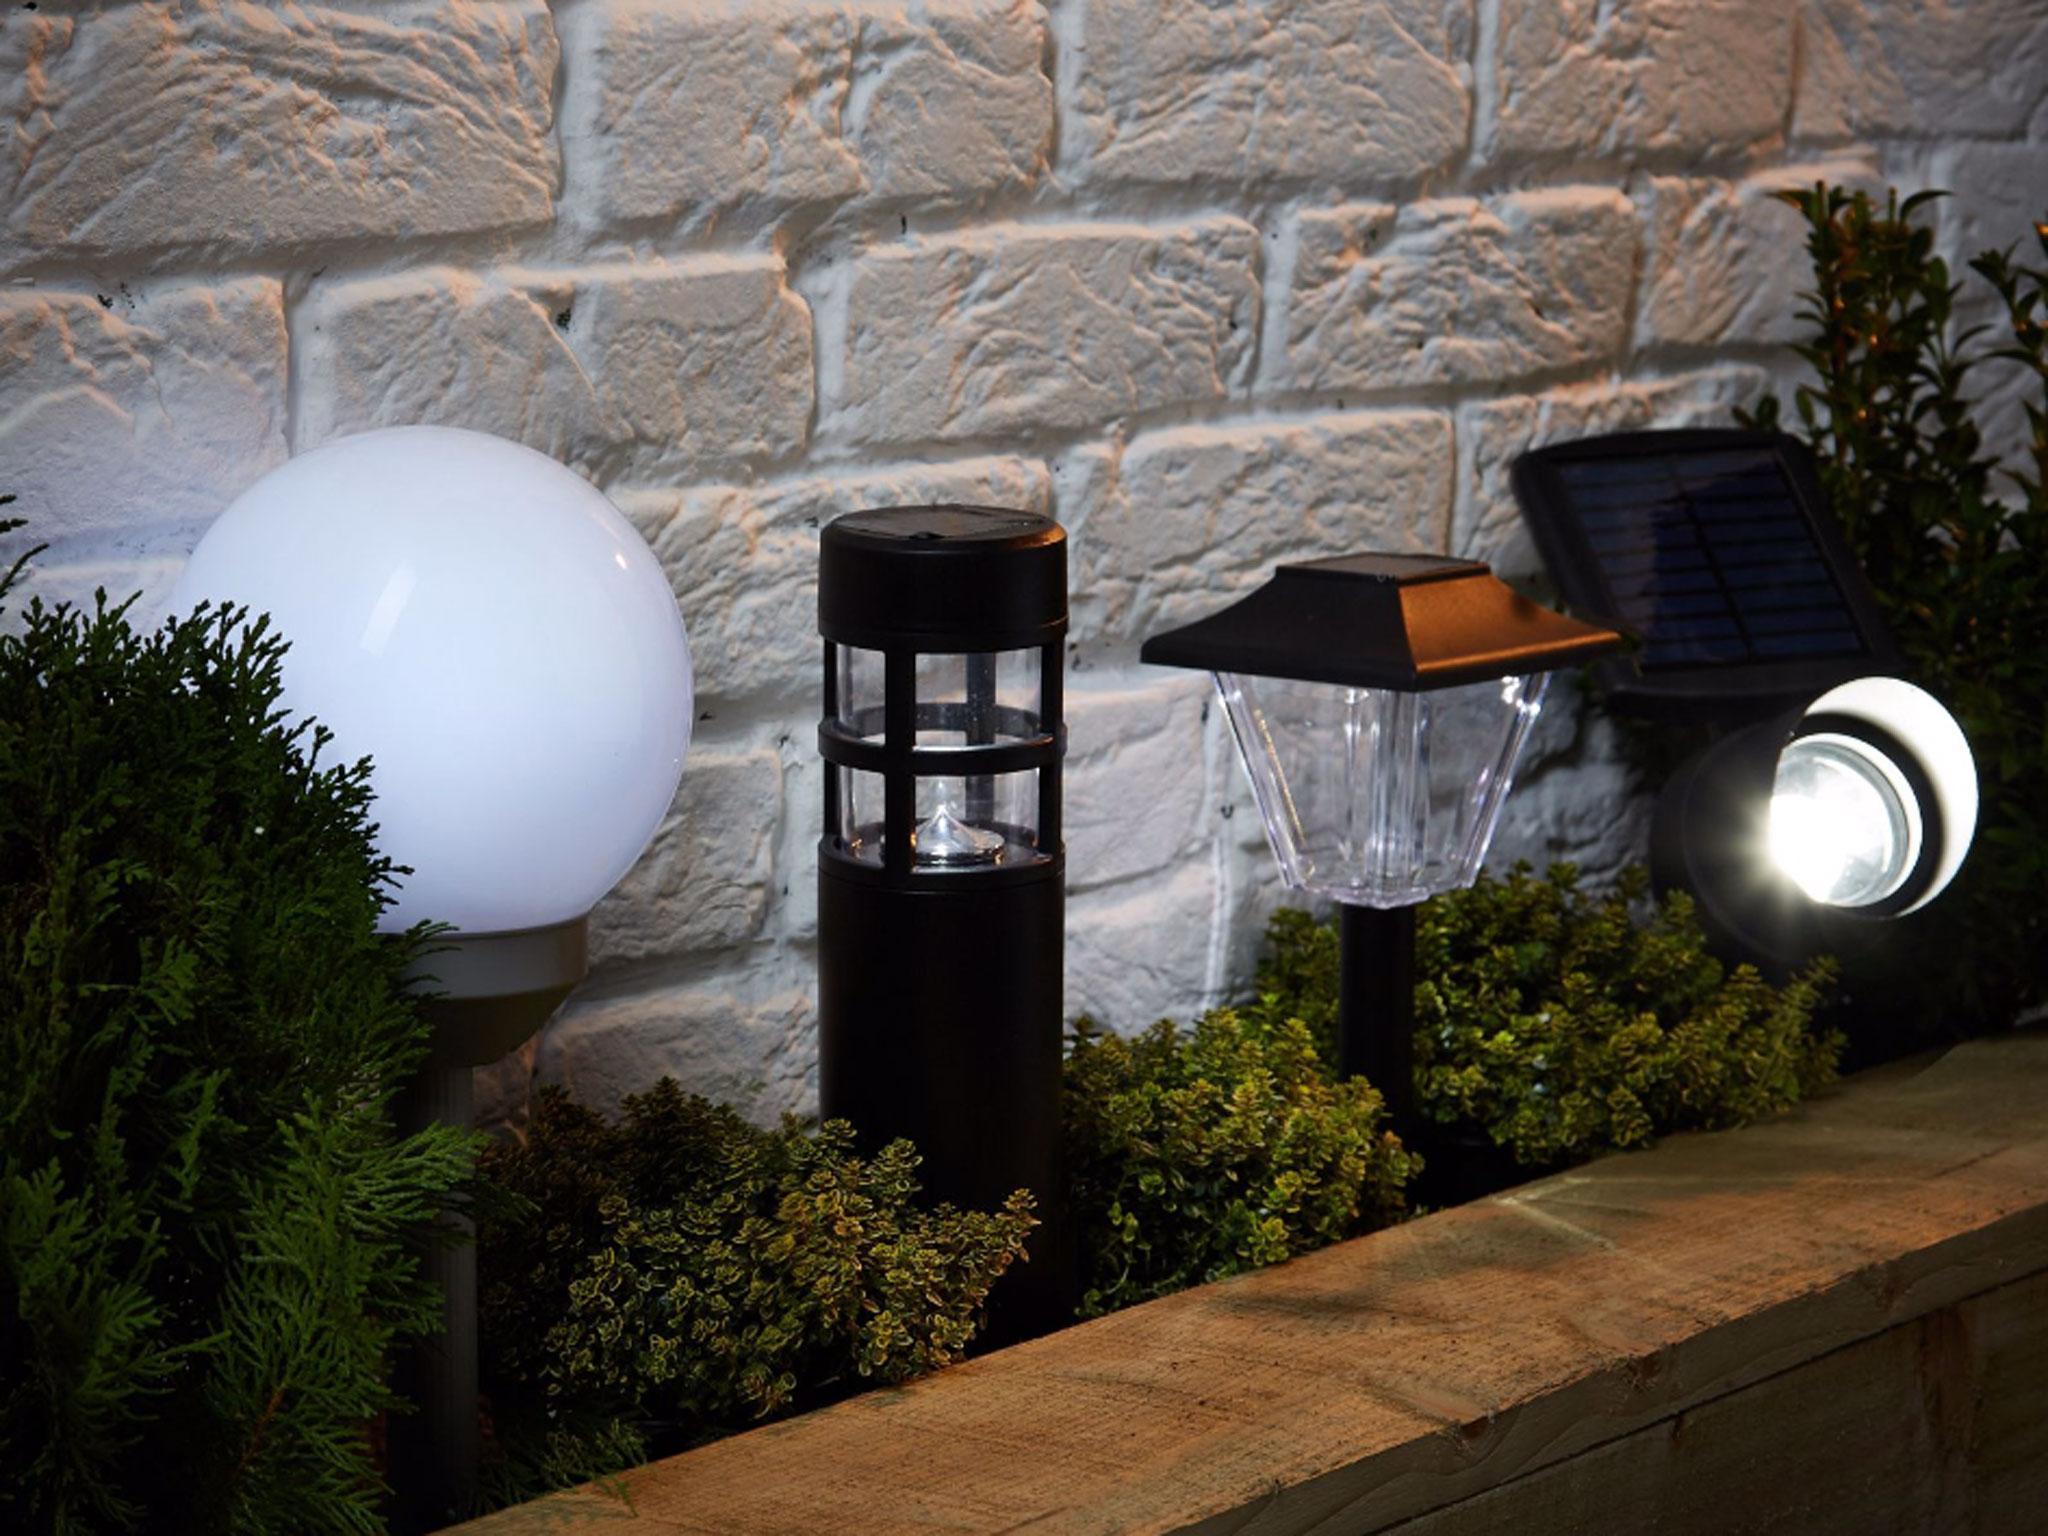 3 Solar LED Bright Deck Lights Outdoor Garden Patio Railing Path Lighting WHITE